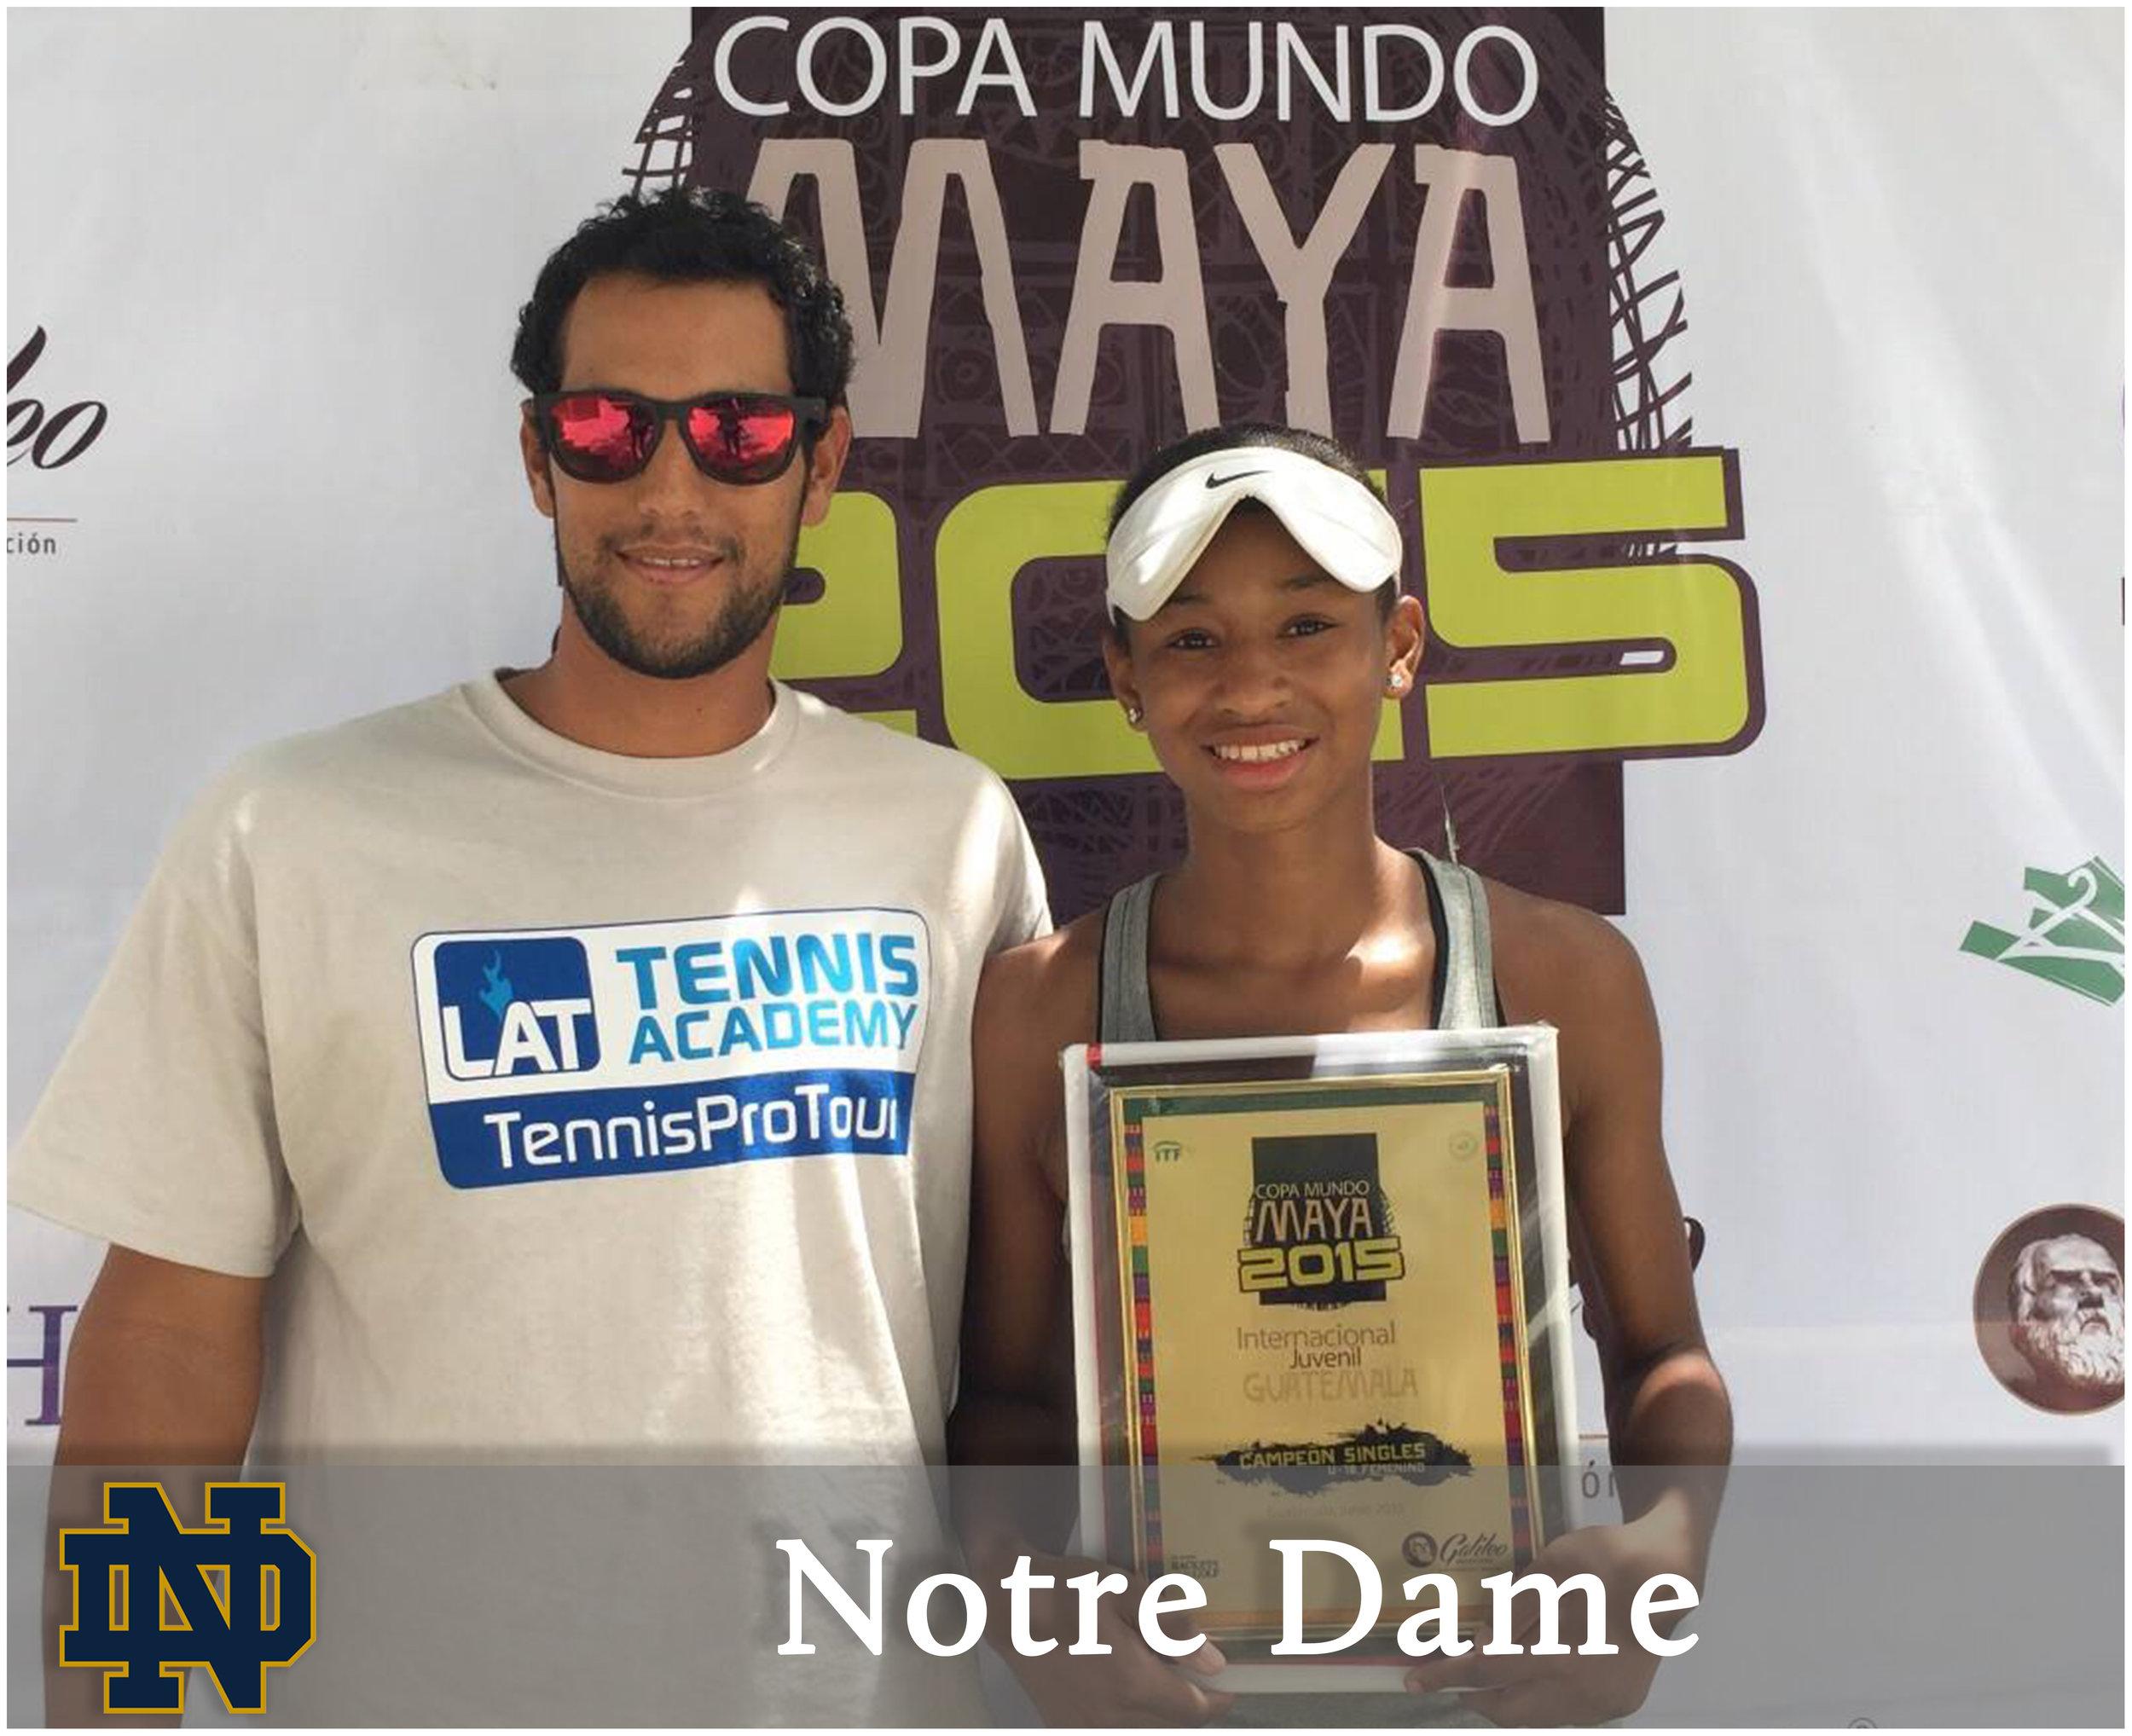 - Zoe Spence (Chicago, Illinois)Blue-Chip Recruit - #19 on TennisRecruiting#226 ITF World Junior RankingCopa Mundo Maya ITF - Singles Championdef. Yuki Naito (#32 ITF Juniors)